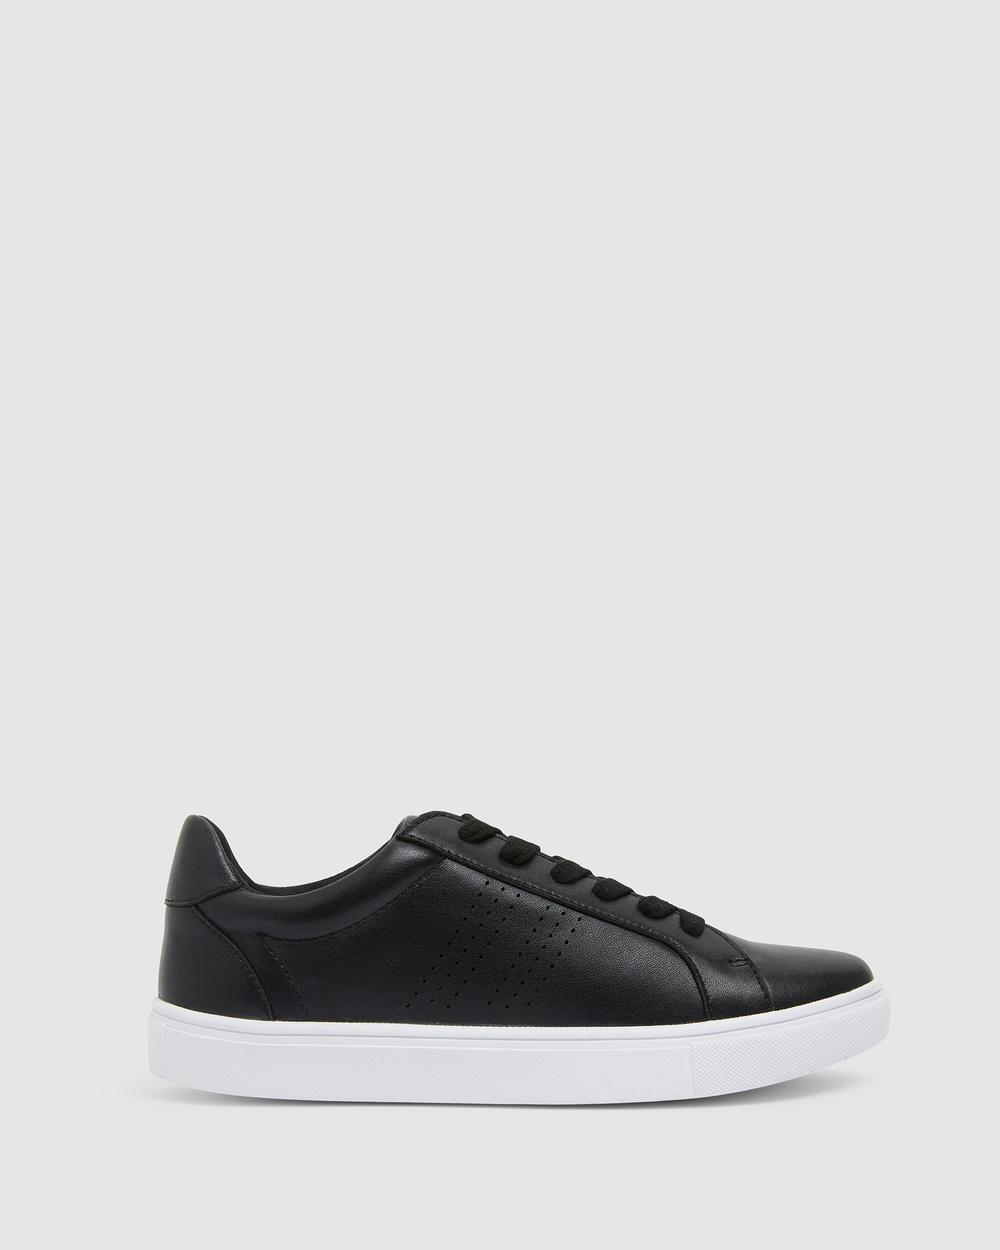 Sandler Shazam Lifestyle Sneakers Black Australia